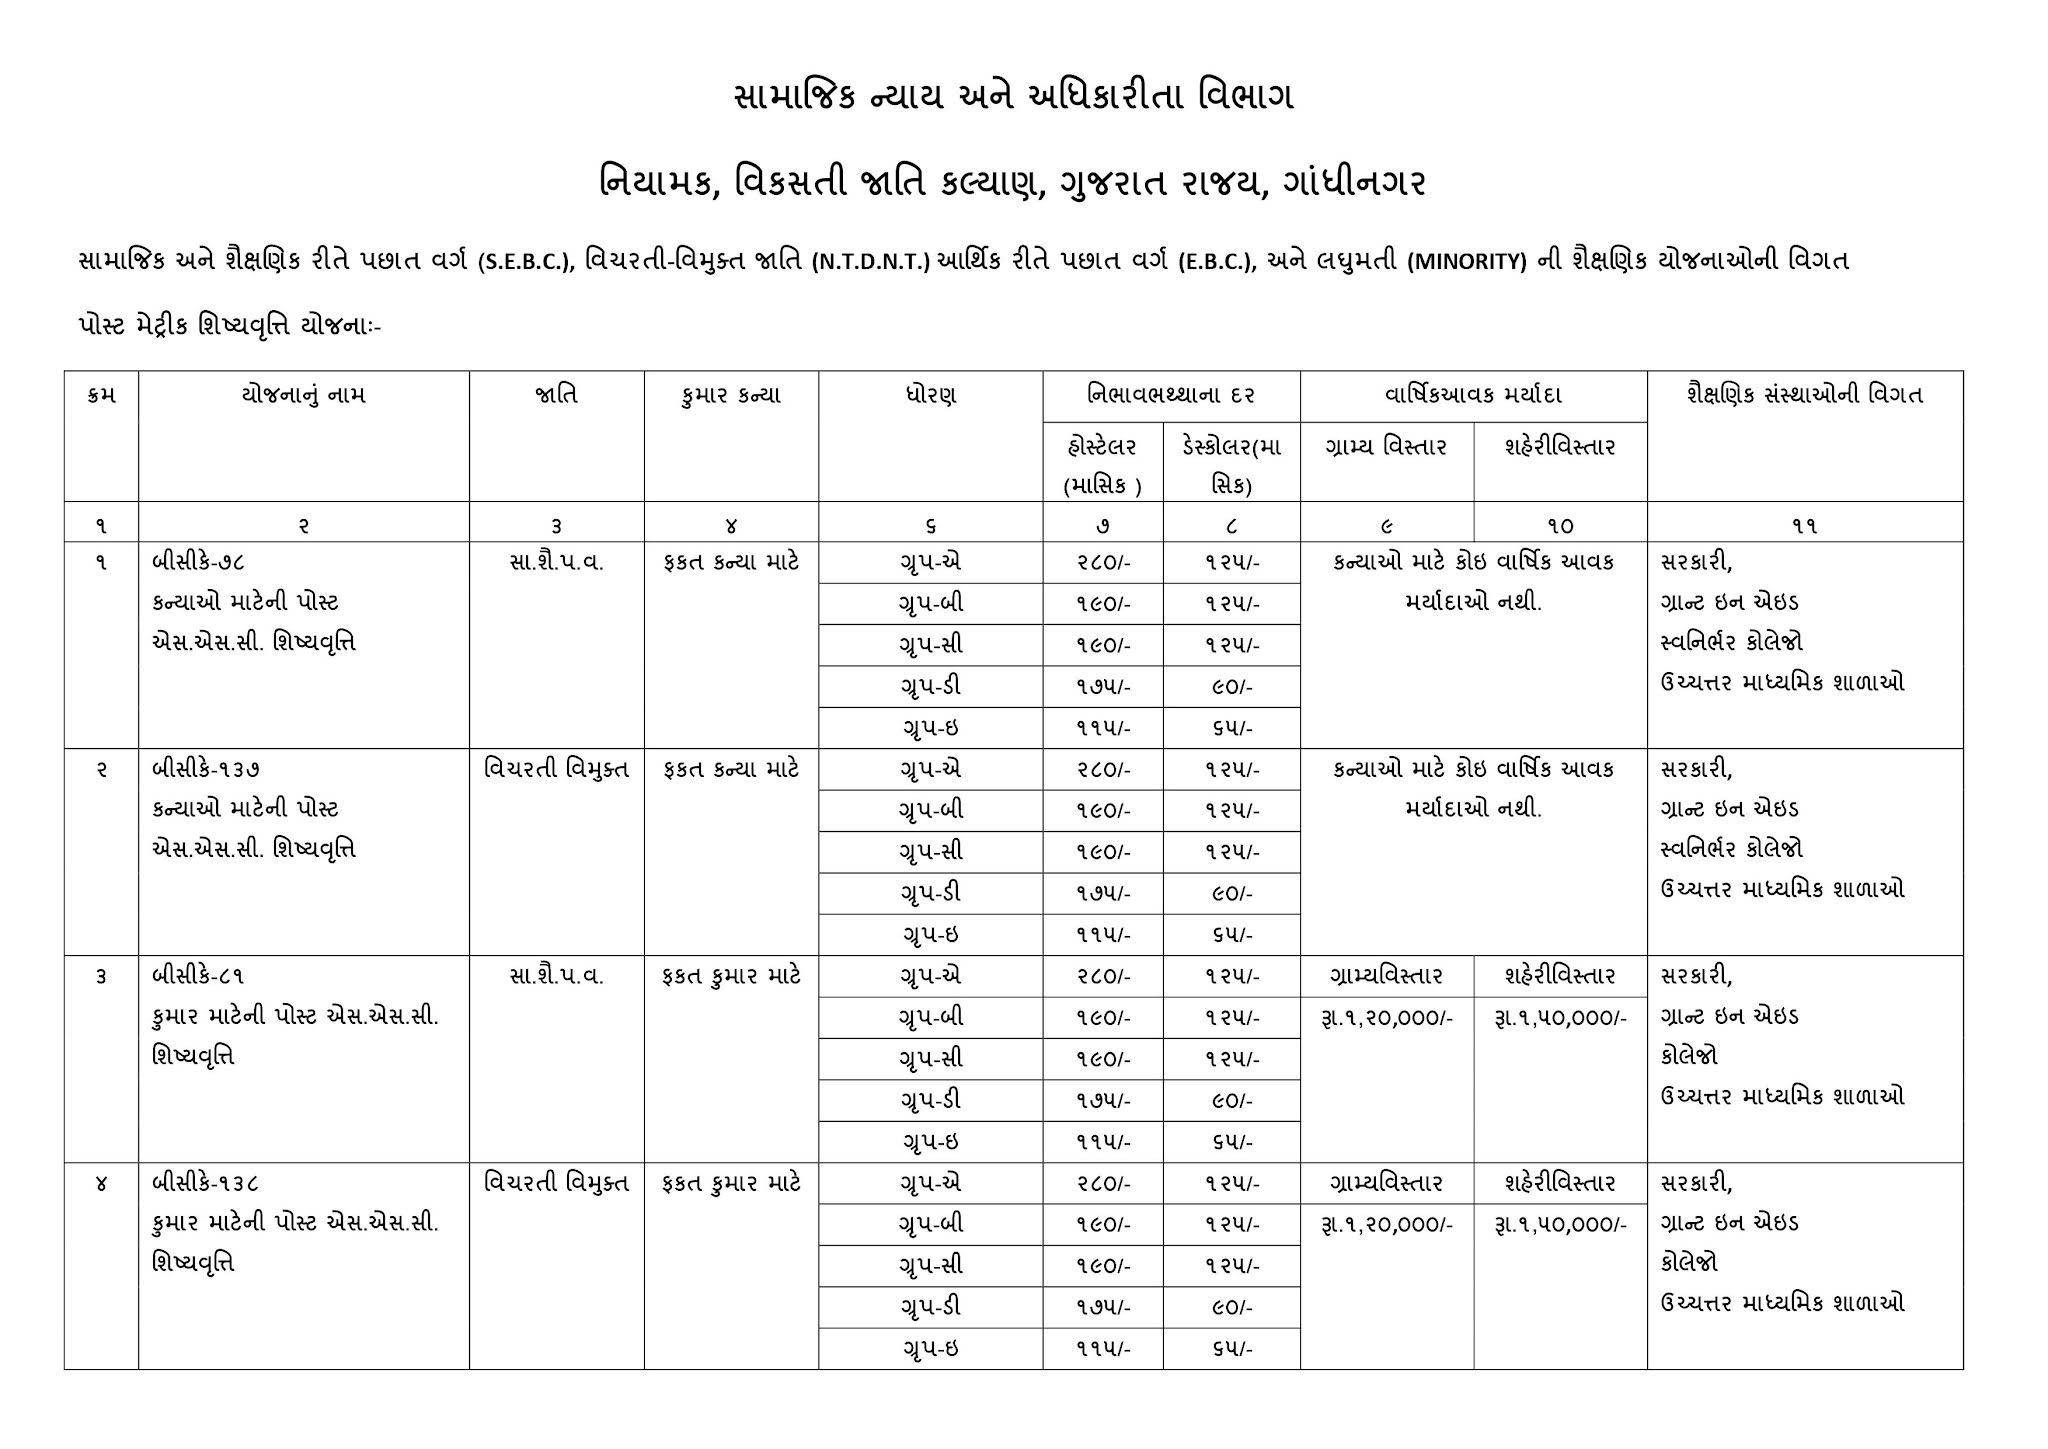 Digital Gujarat Scholarship Payment Details